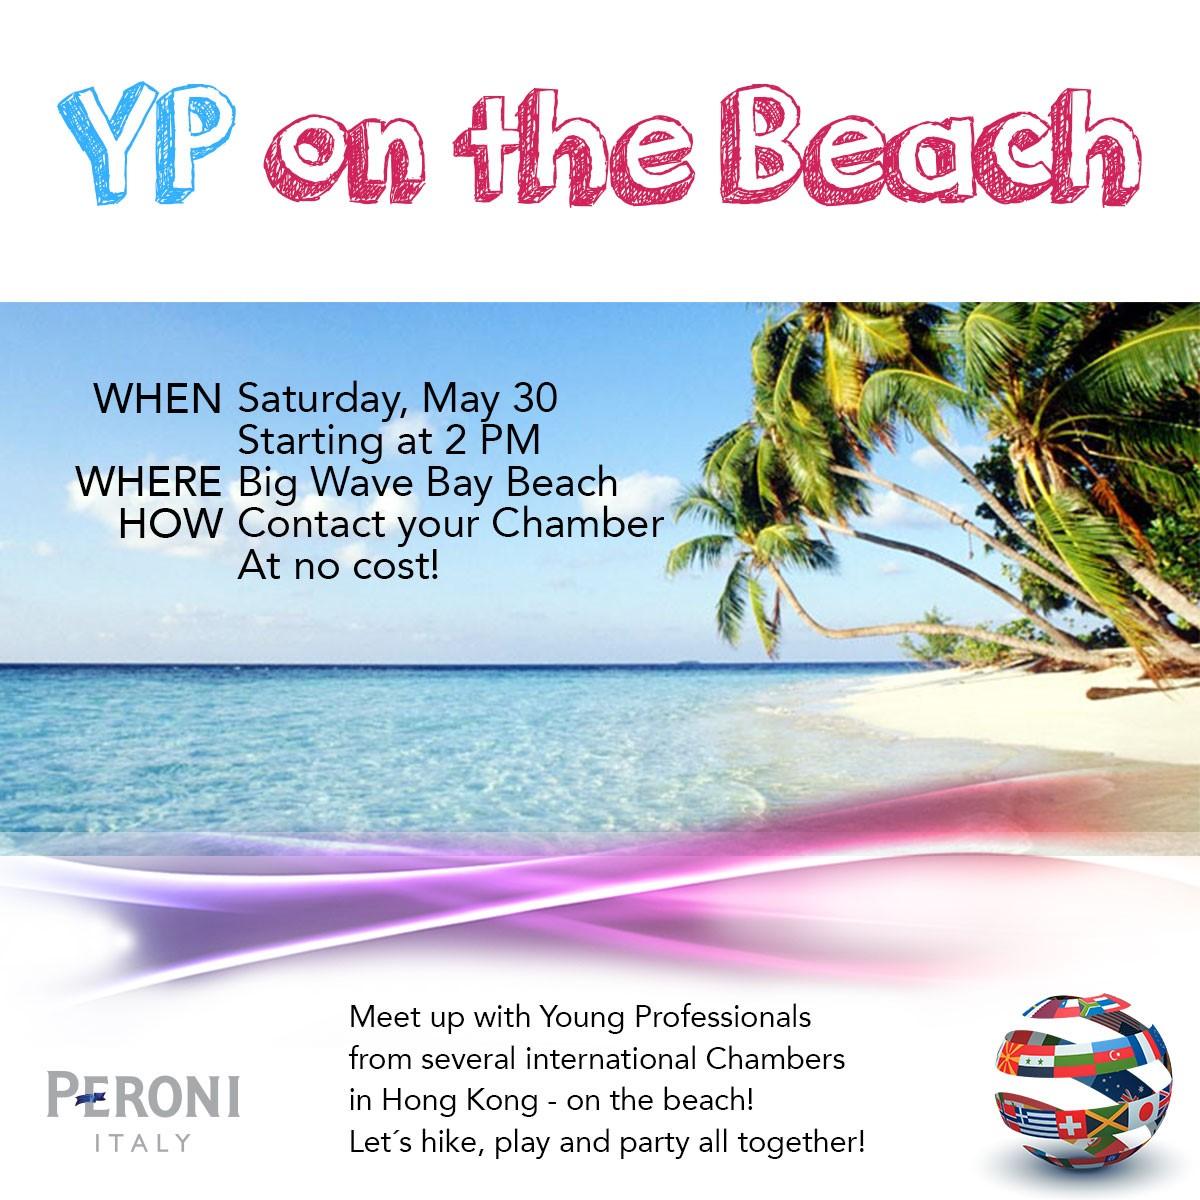 YP on the Beach